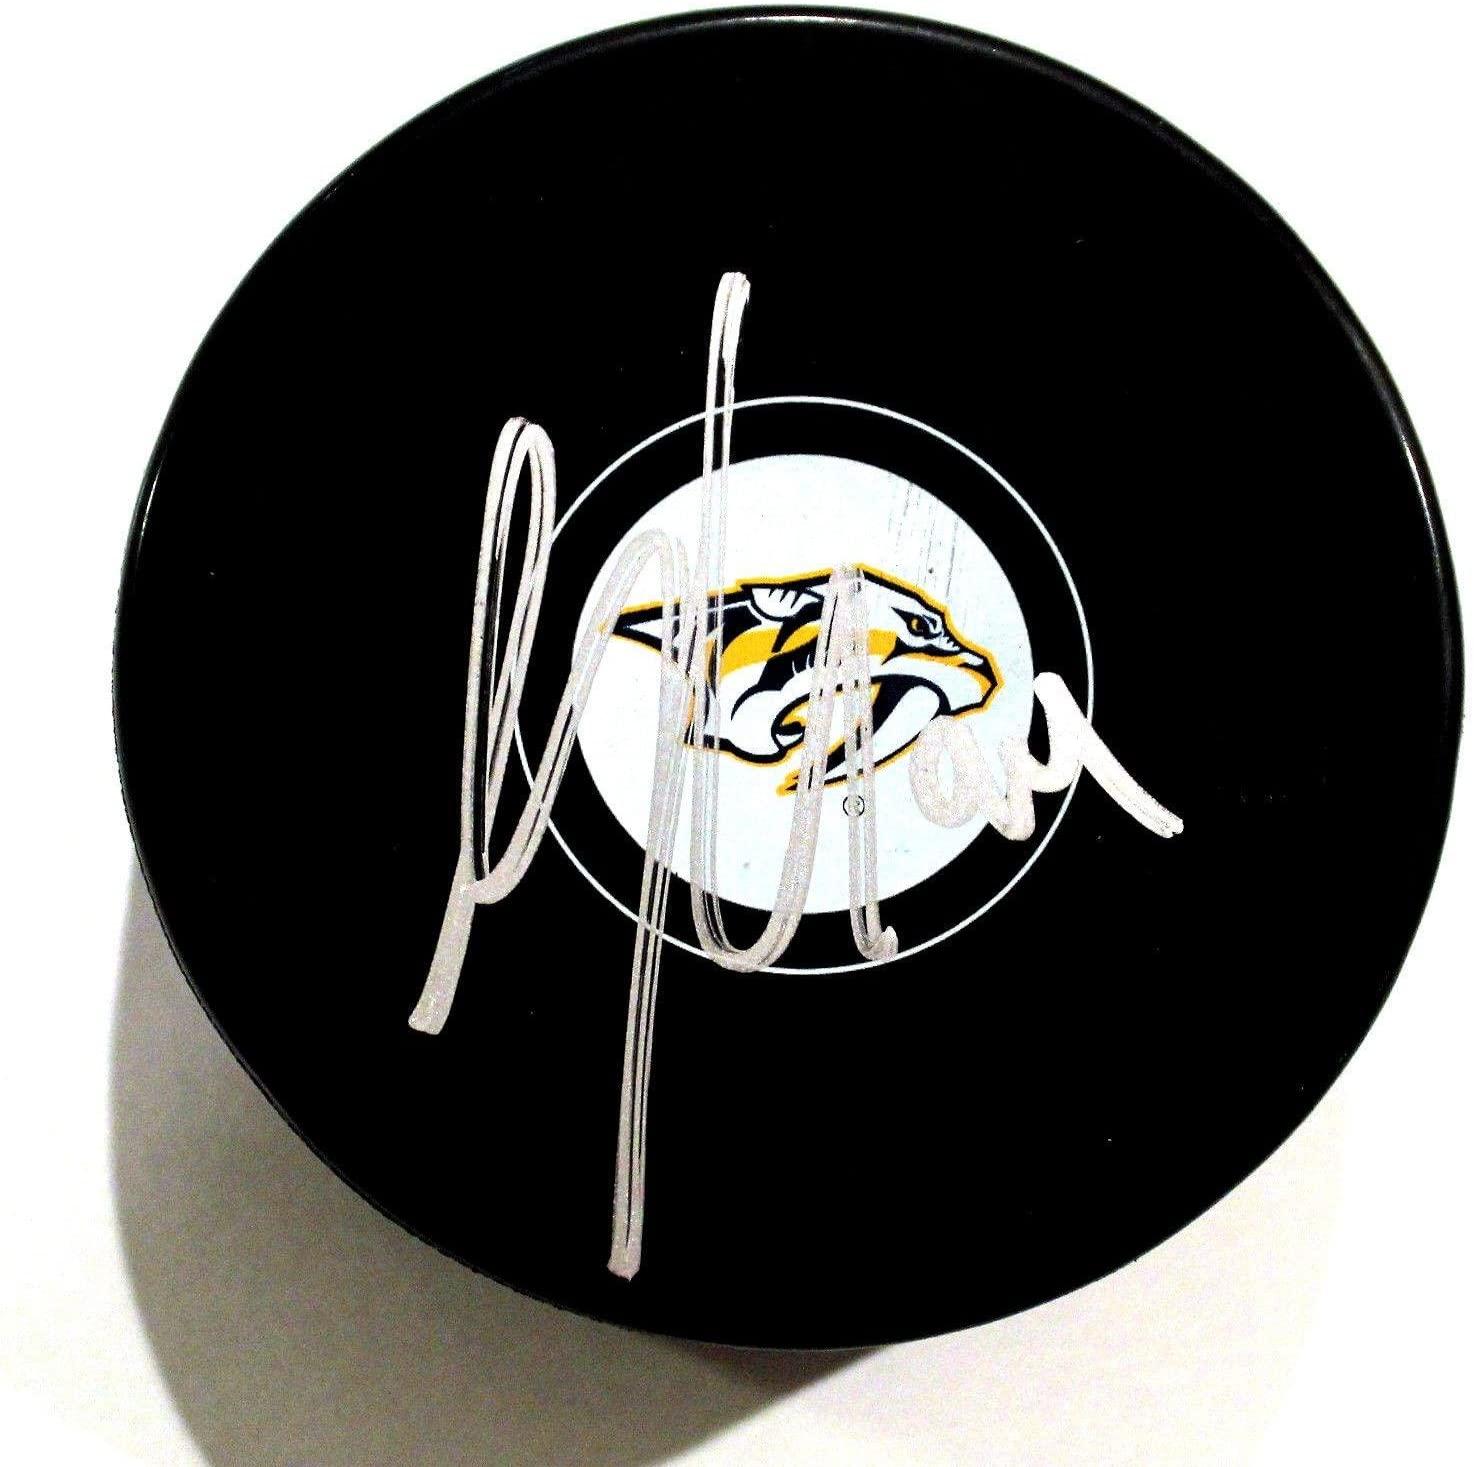 Samuel Girard Signed Hockey Puck - w COA #1 - Autographed NHL Pucks